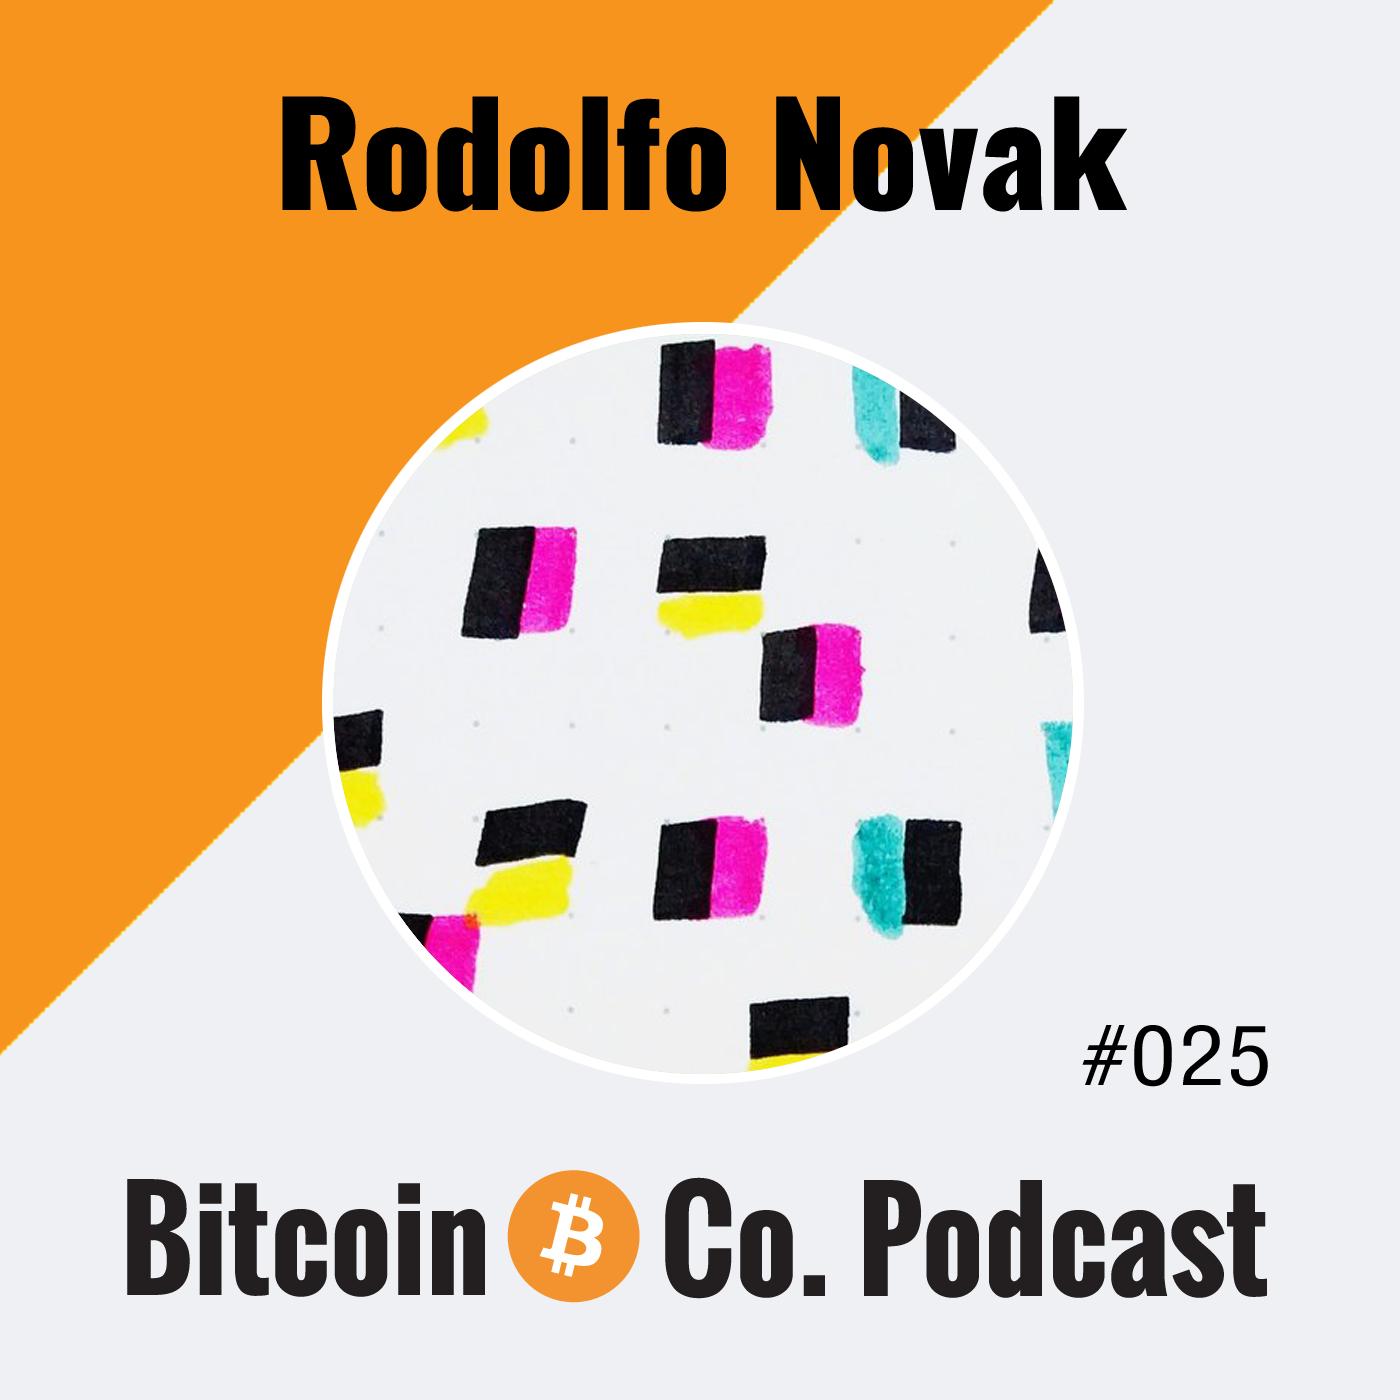 Rodolfo Novak Bitcoin Podcast